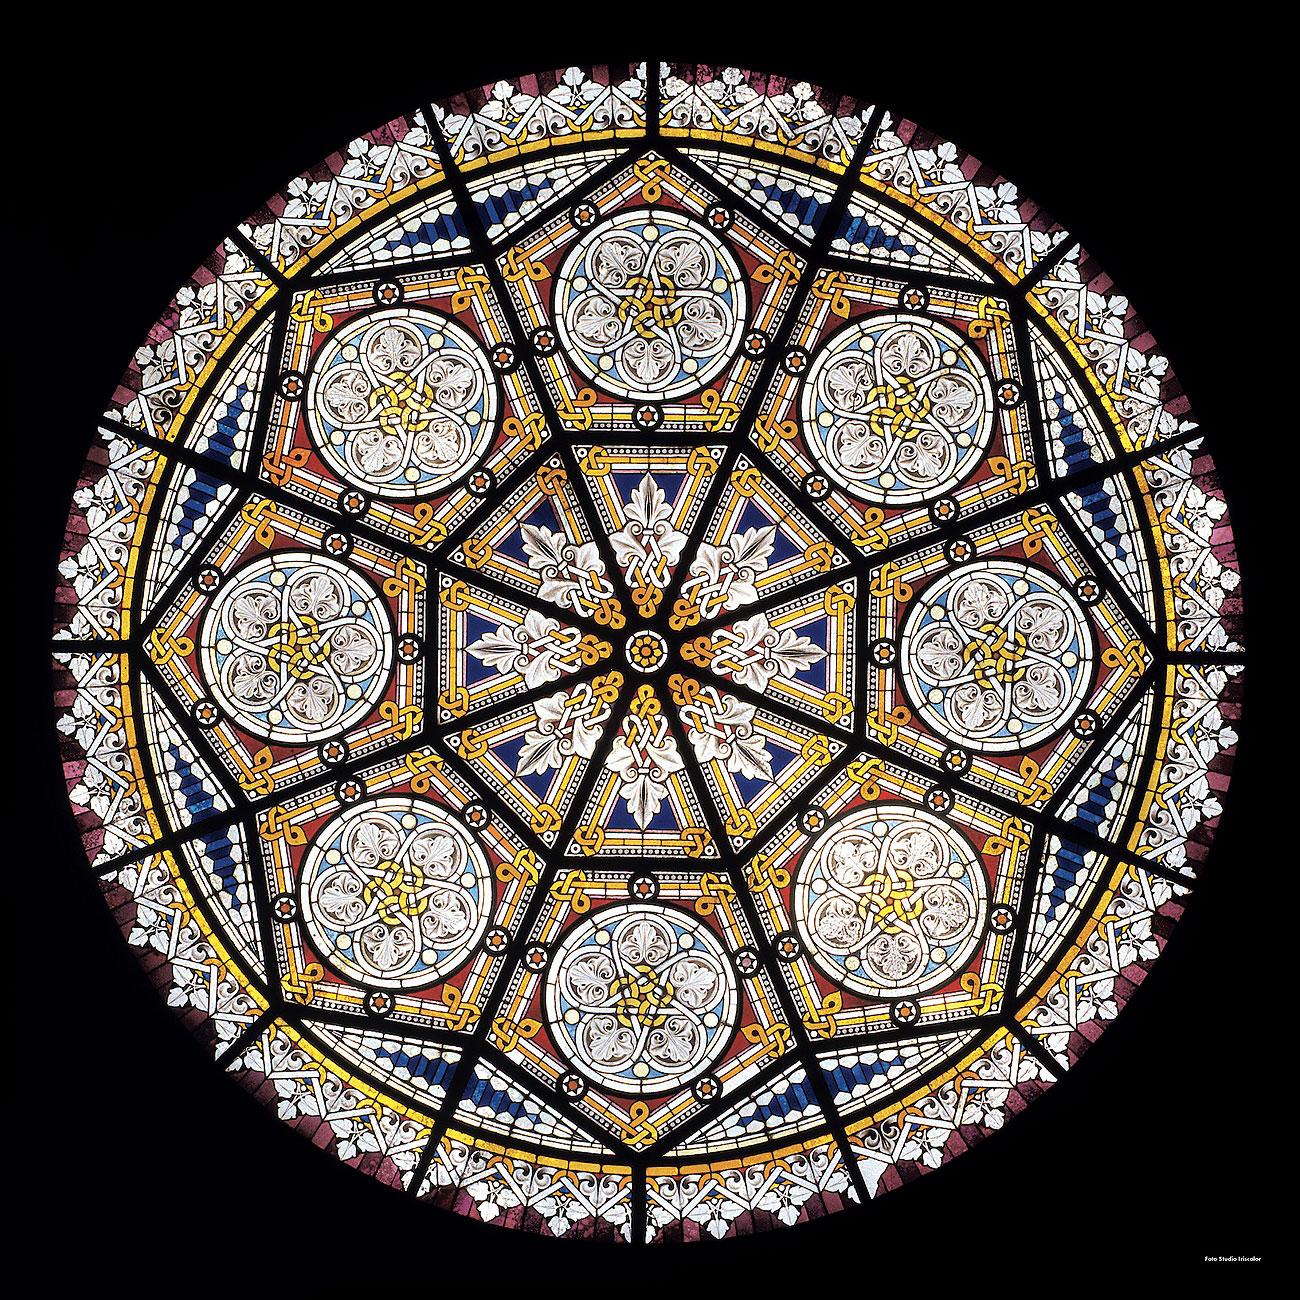 Cupola della Provincia di Perugia - foto Michele Panduri